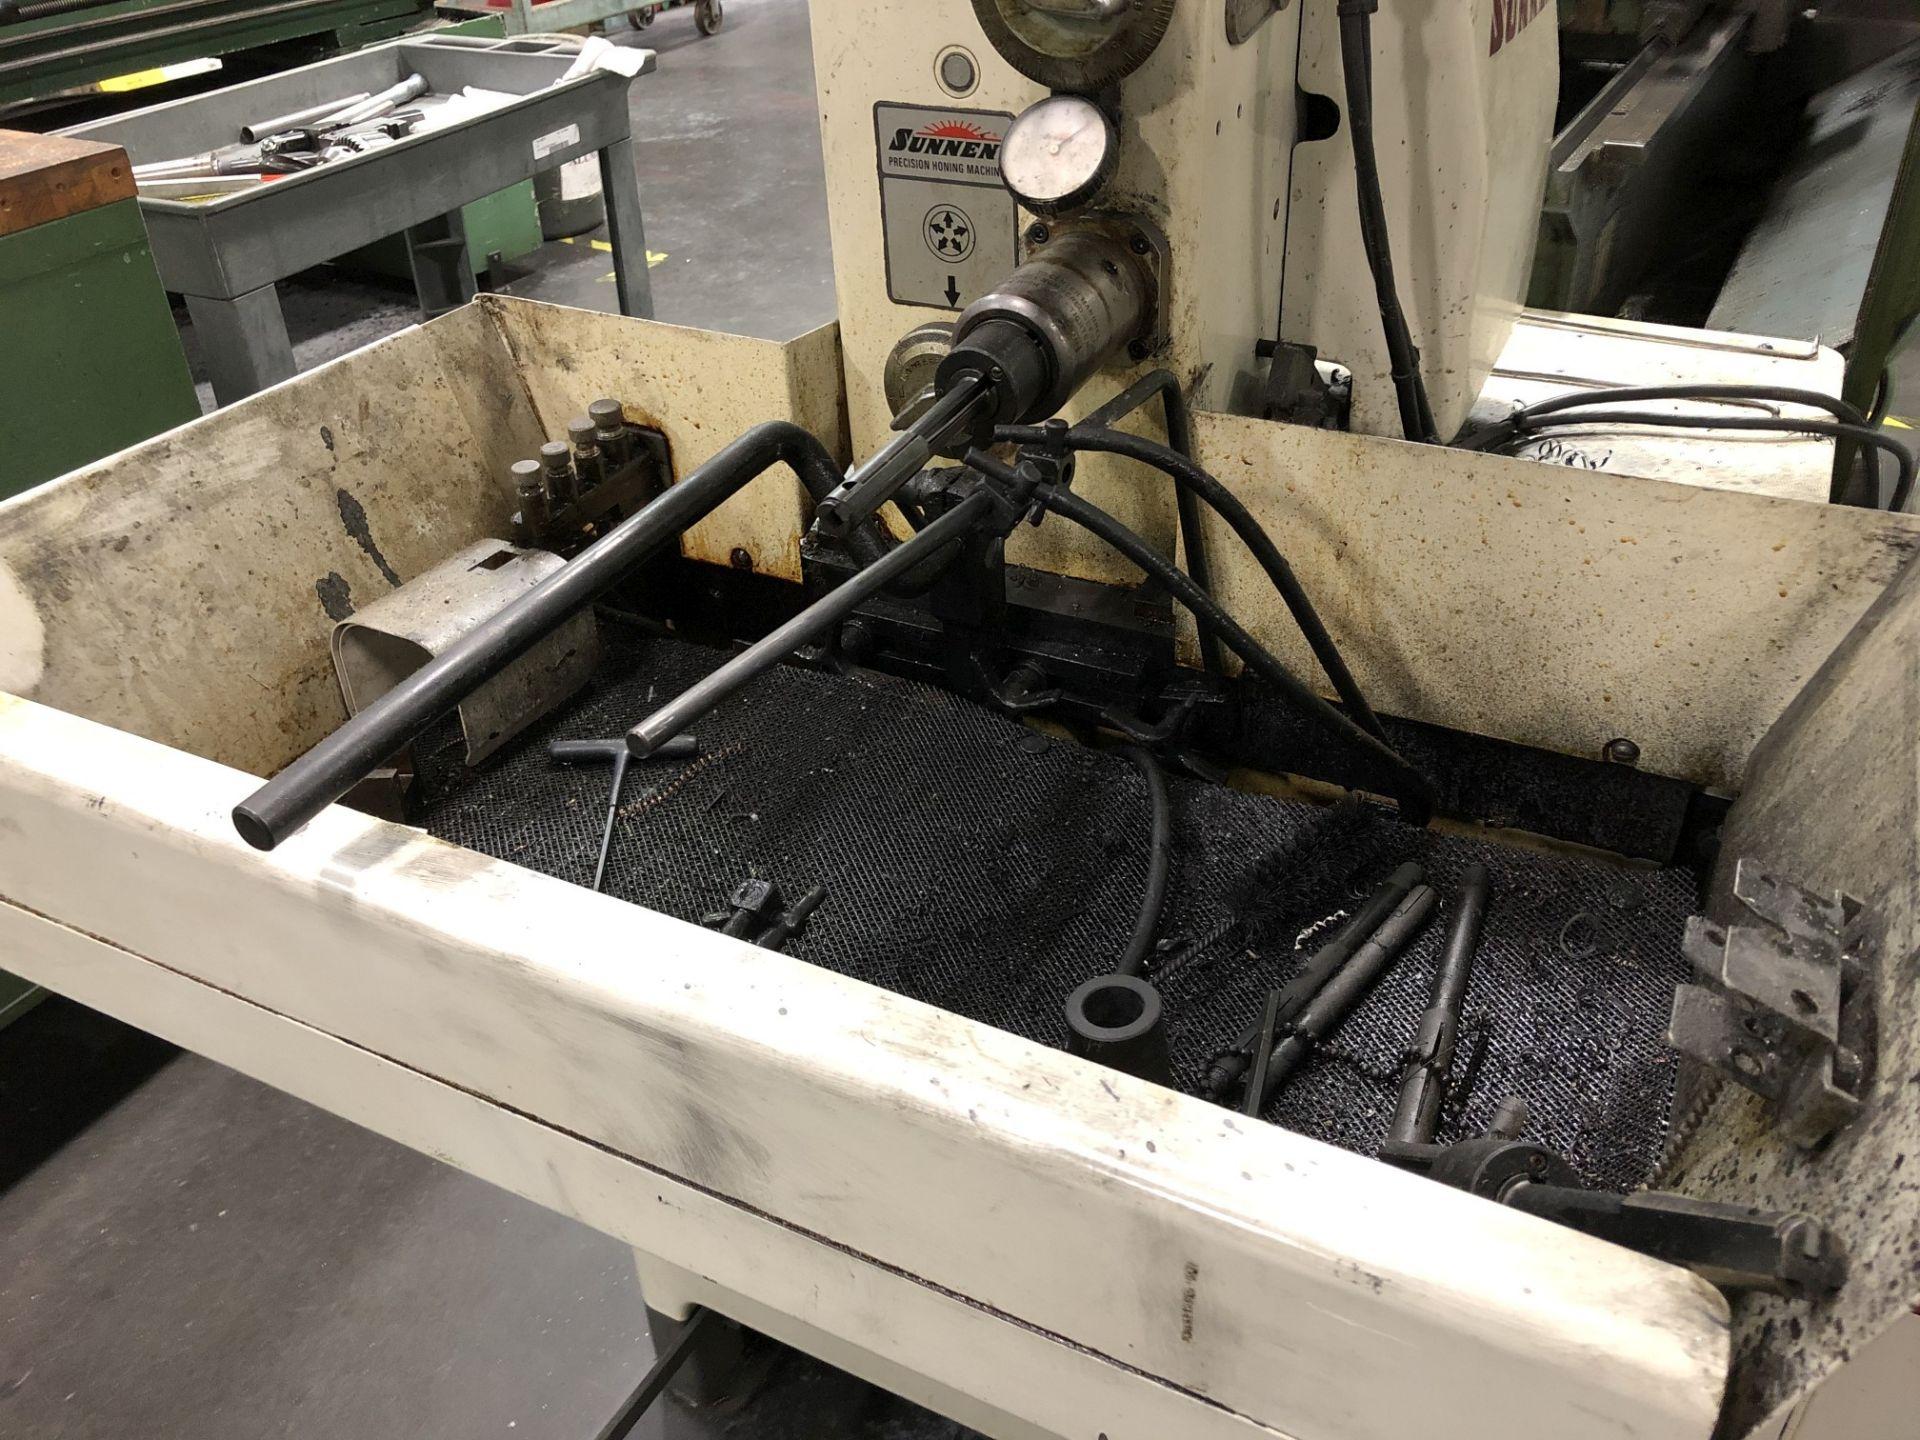 Sunnen MBB-1660 Precision Honing Machine - Image 3 of 8